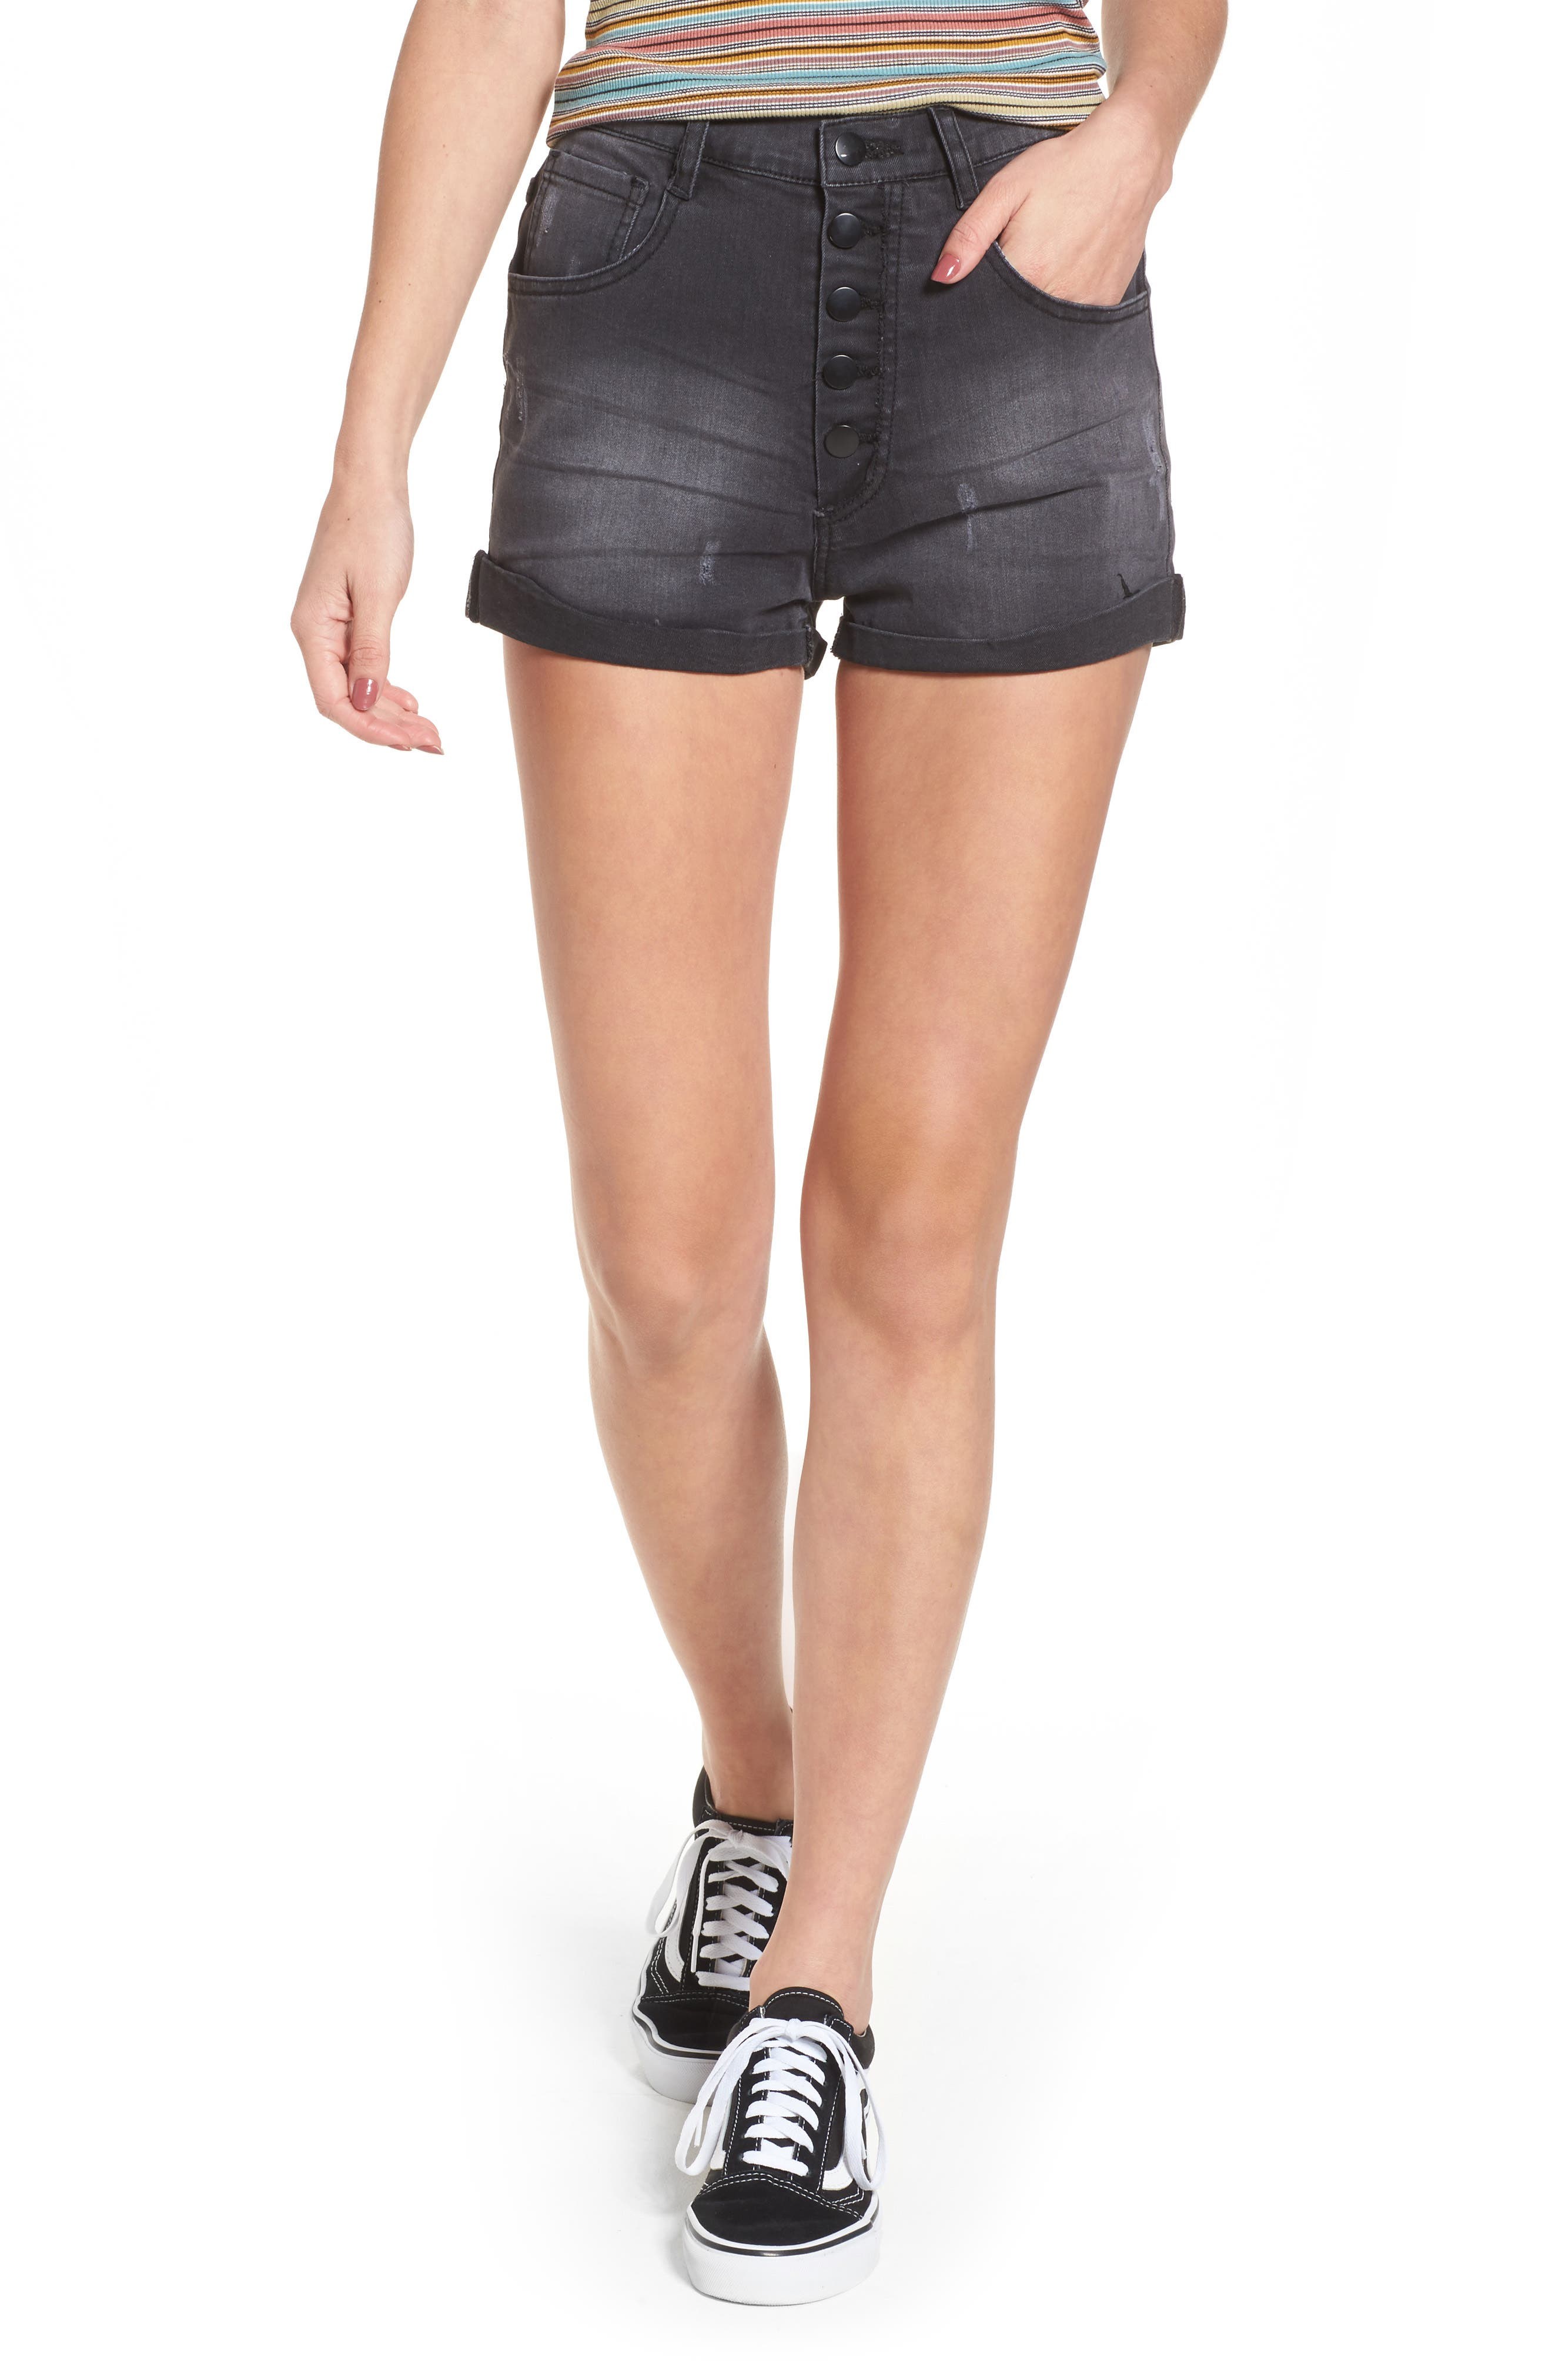 Alternate Image 1 Selected - Lira Clothing Rachel High Waisted Denim Shorts